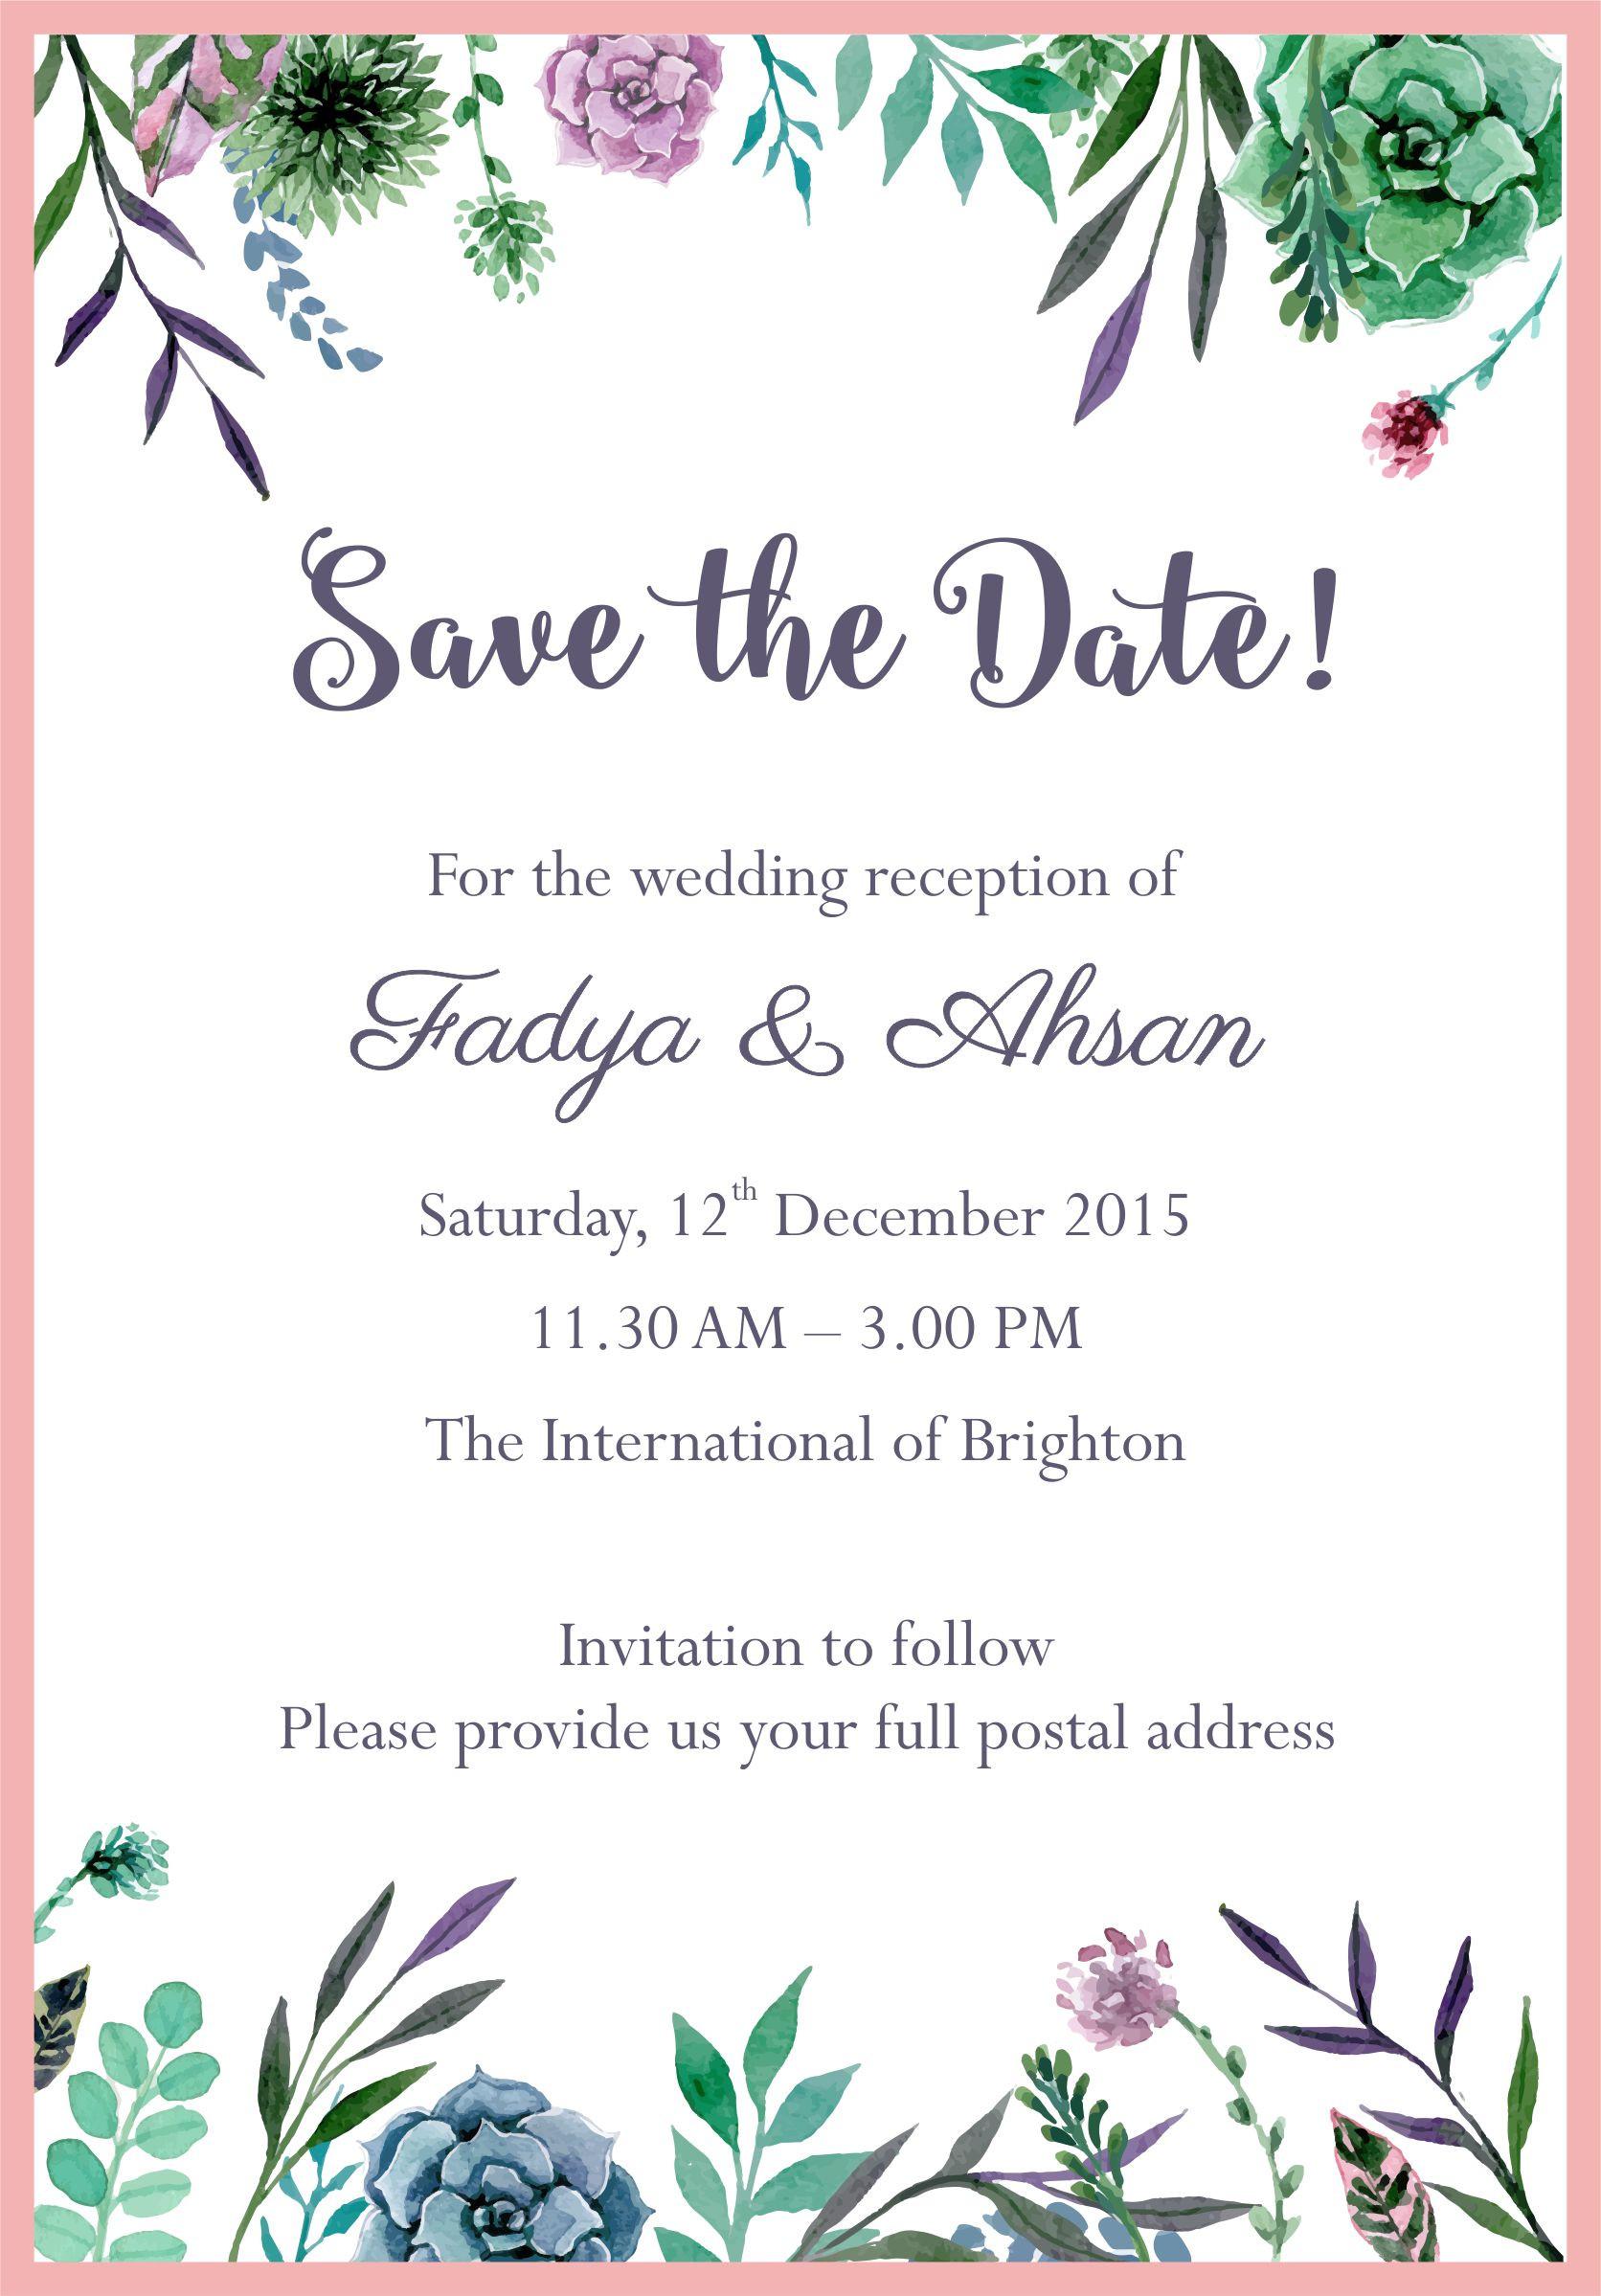 Wedding Email Invitations  Free Email Wedding Invitation Templates Wedding